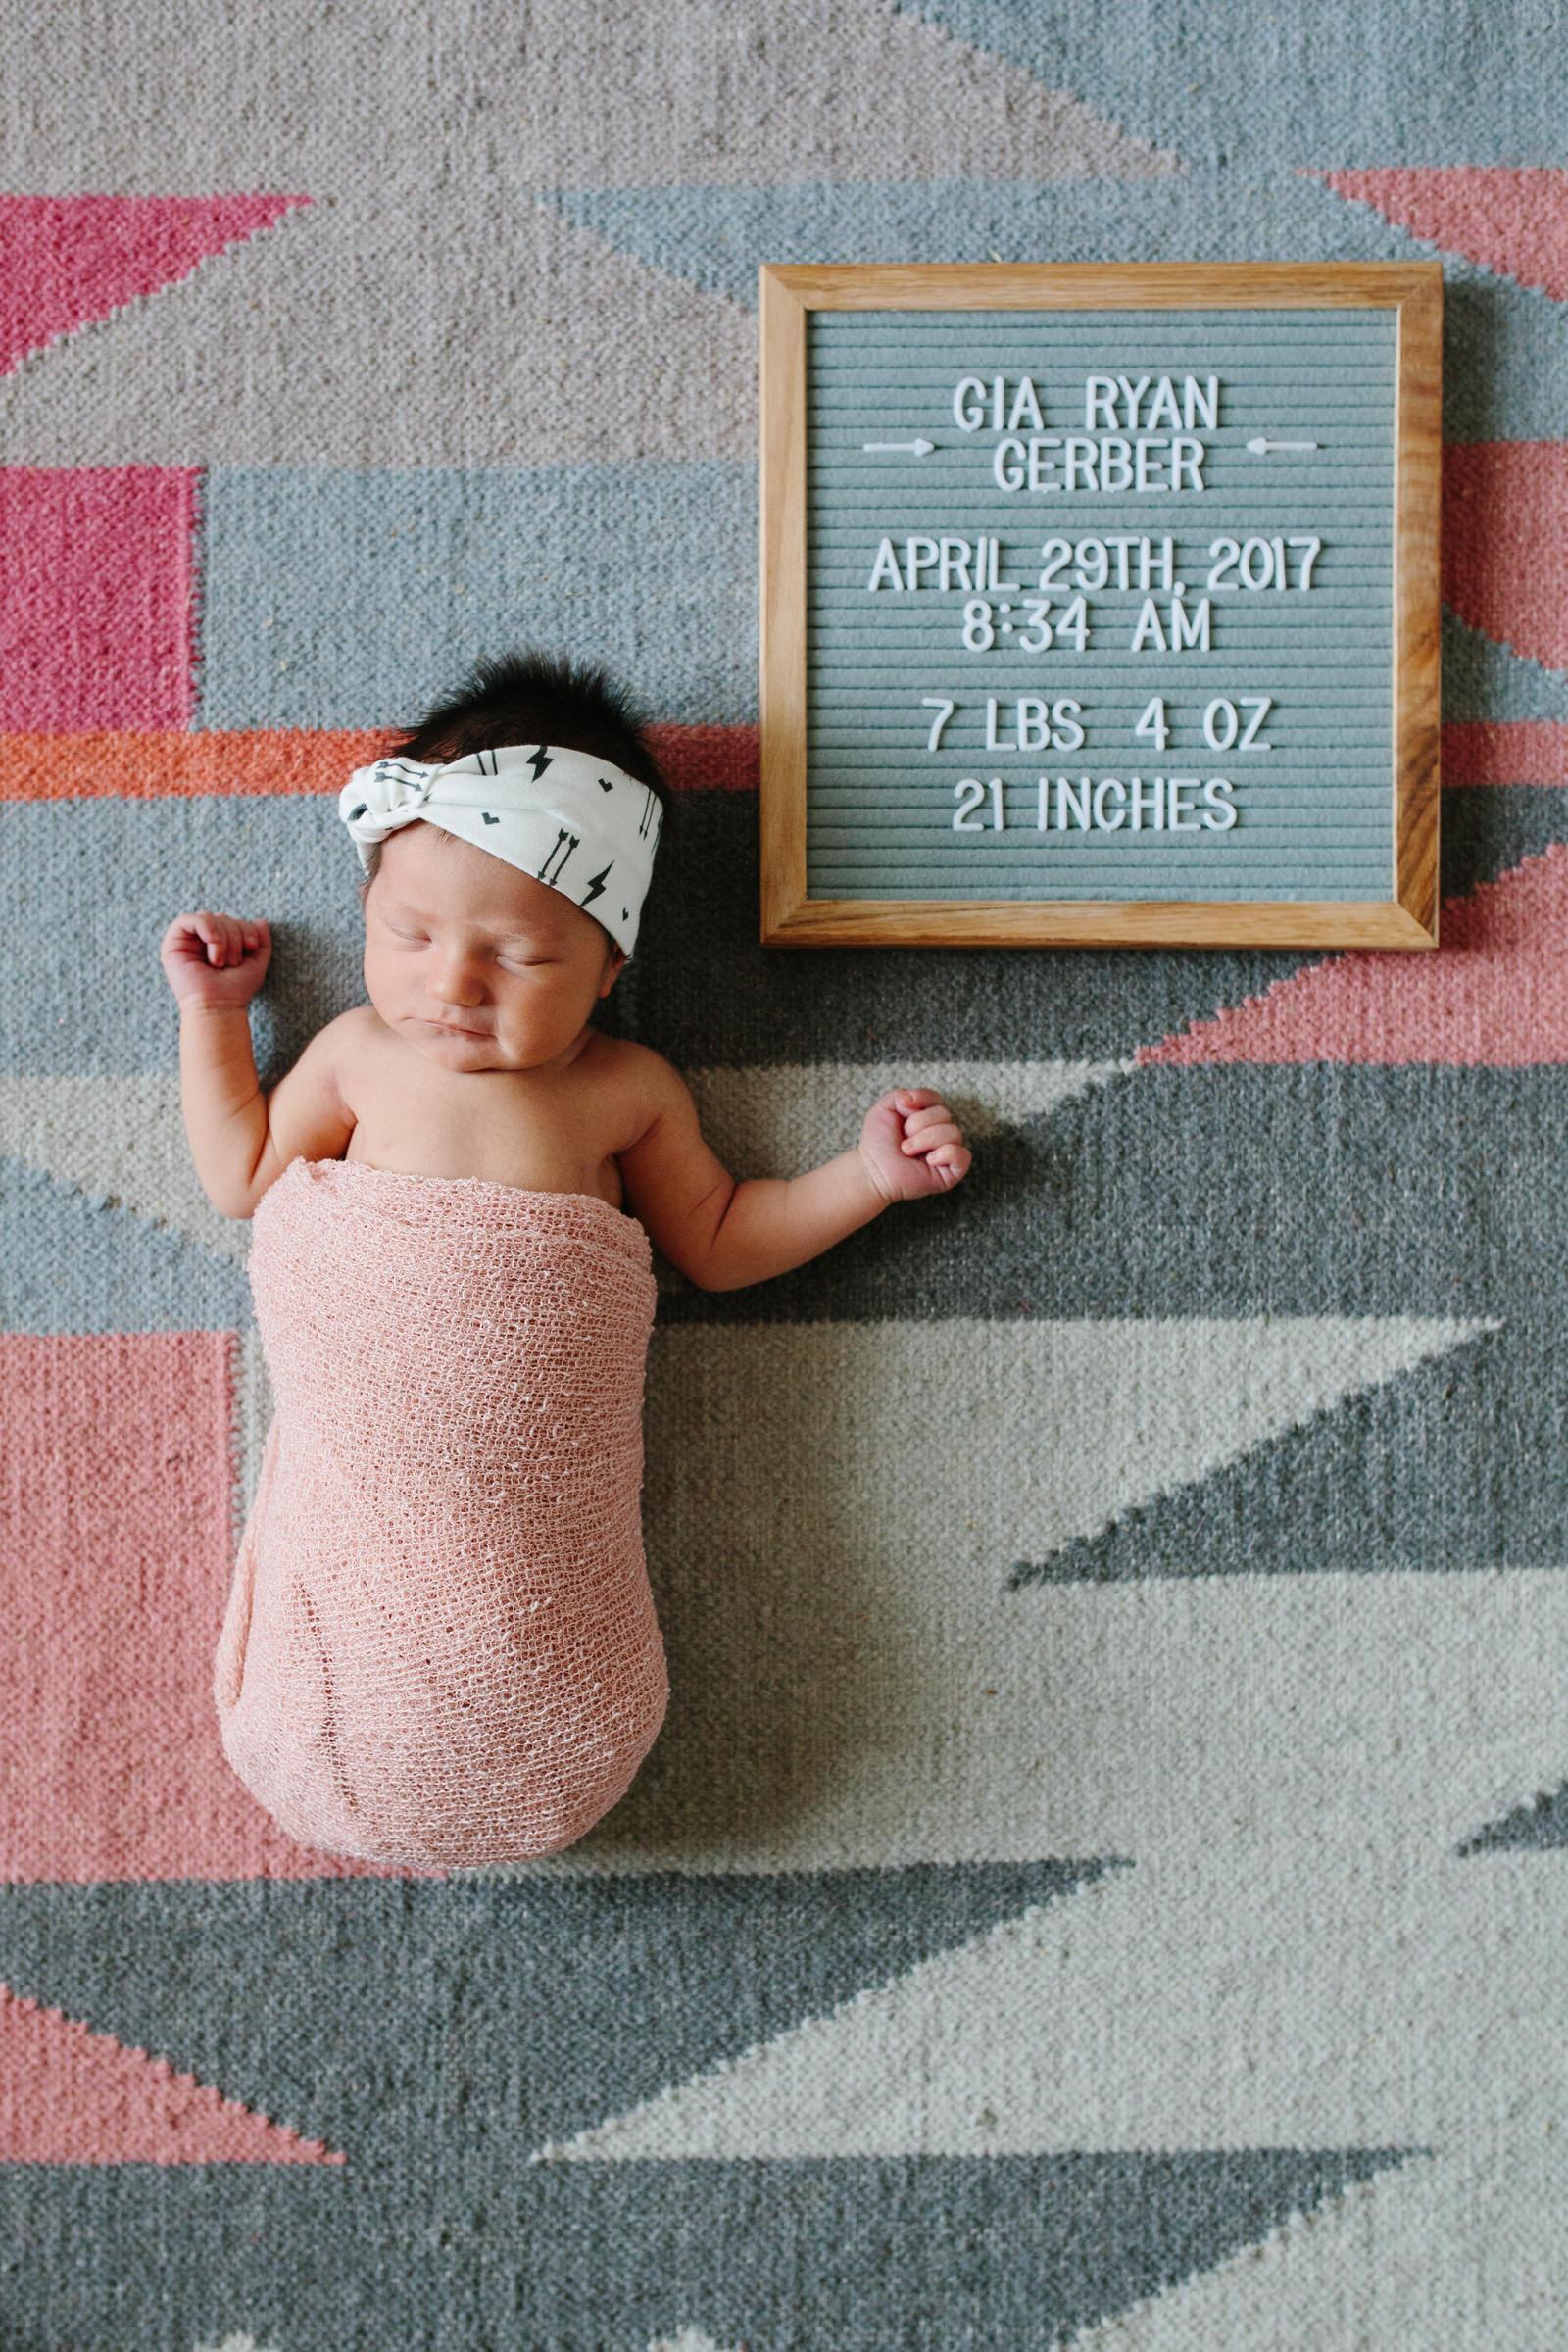 Edmond Oklahoma newborn photos in home, natural nursery baby girl photos laying on rug swaddled.